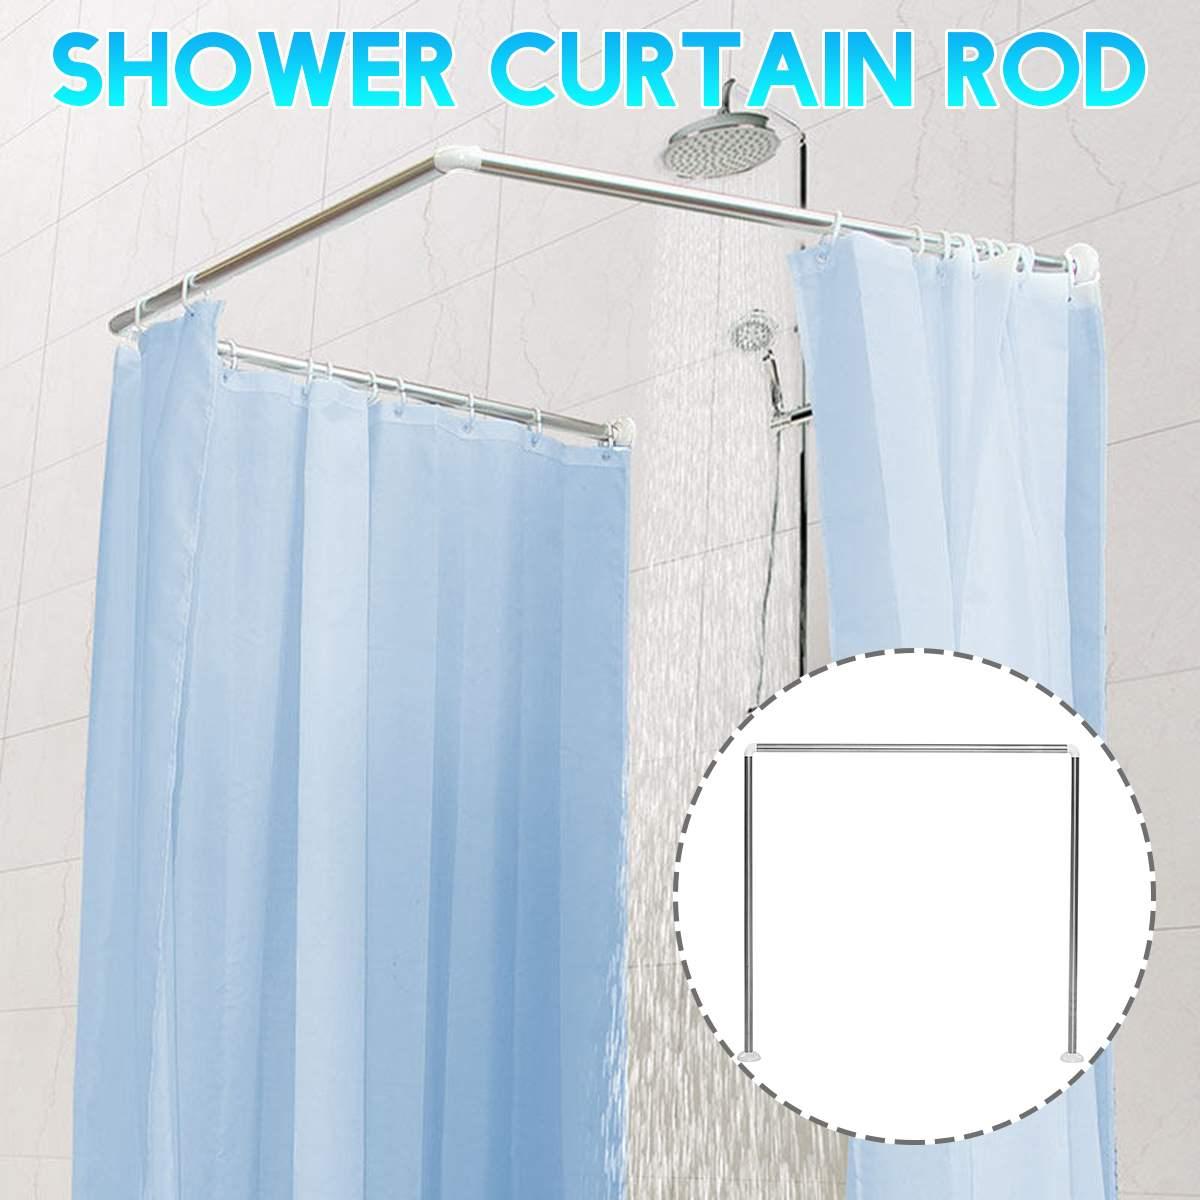 stainless steel aluminum alloy l u shape adjustable bathroom shower curtain rods curved rail rod bathroom bar up to 20kg bearing